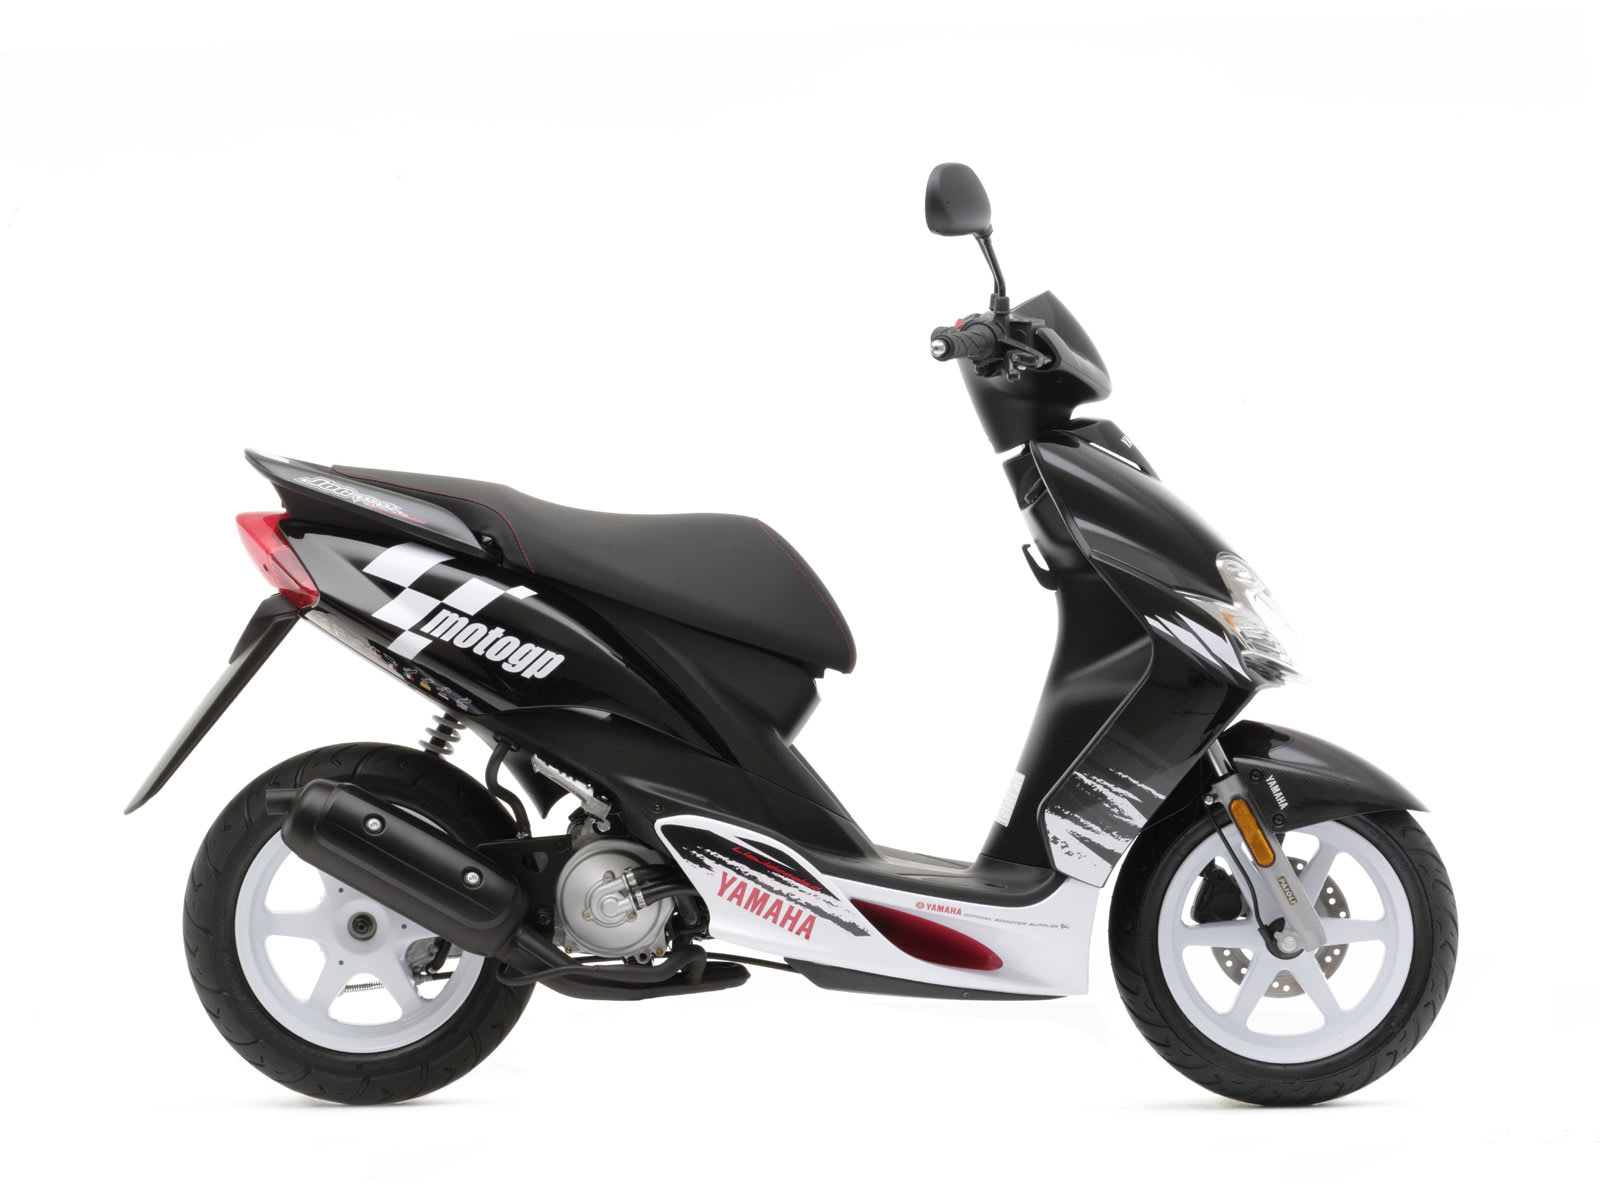 2007 YAMAHA Jog RR MotoGP insurance information, pictures